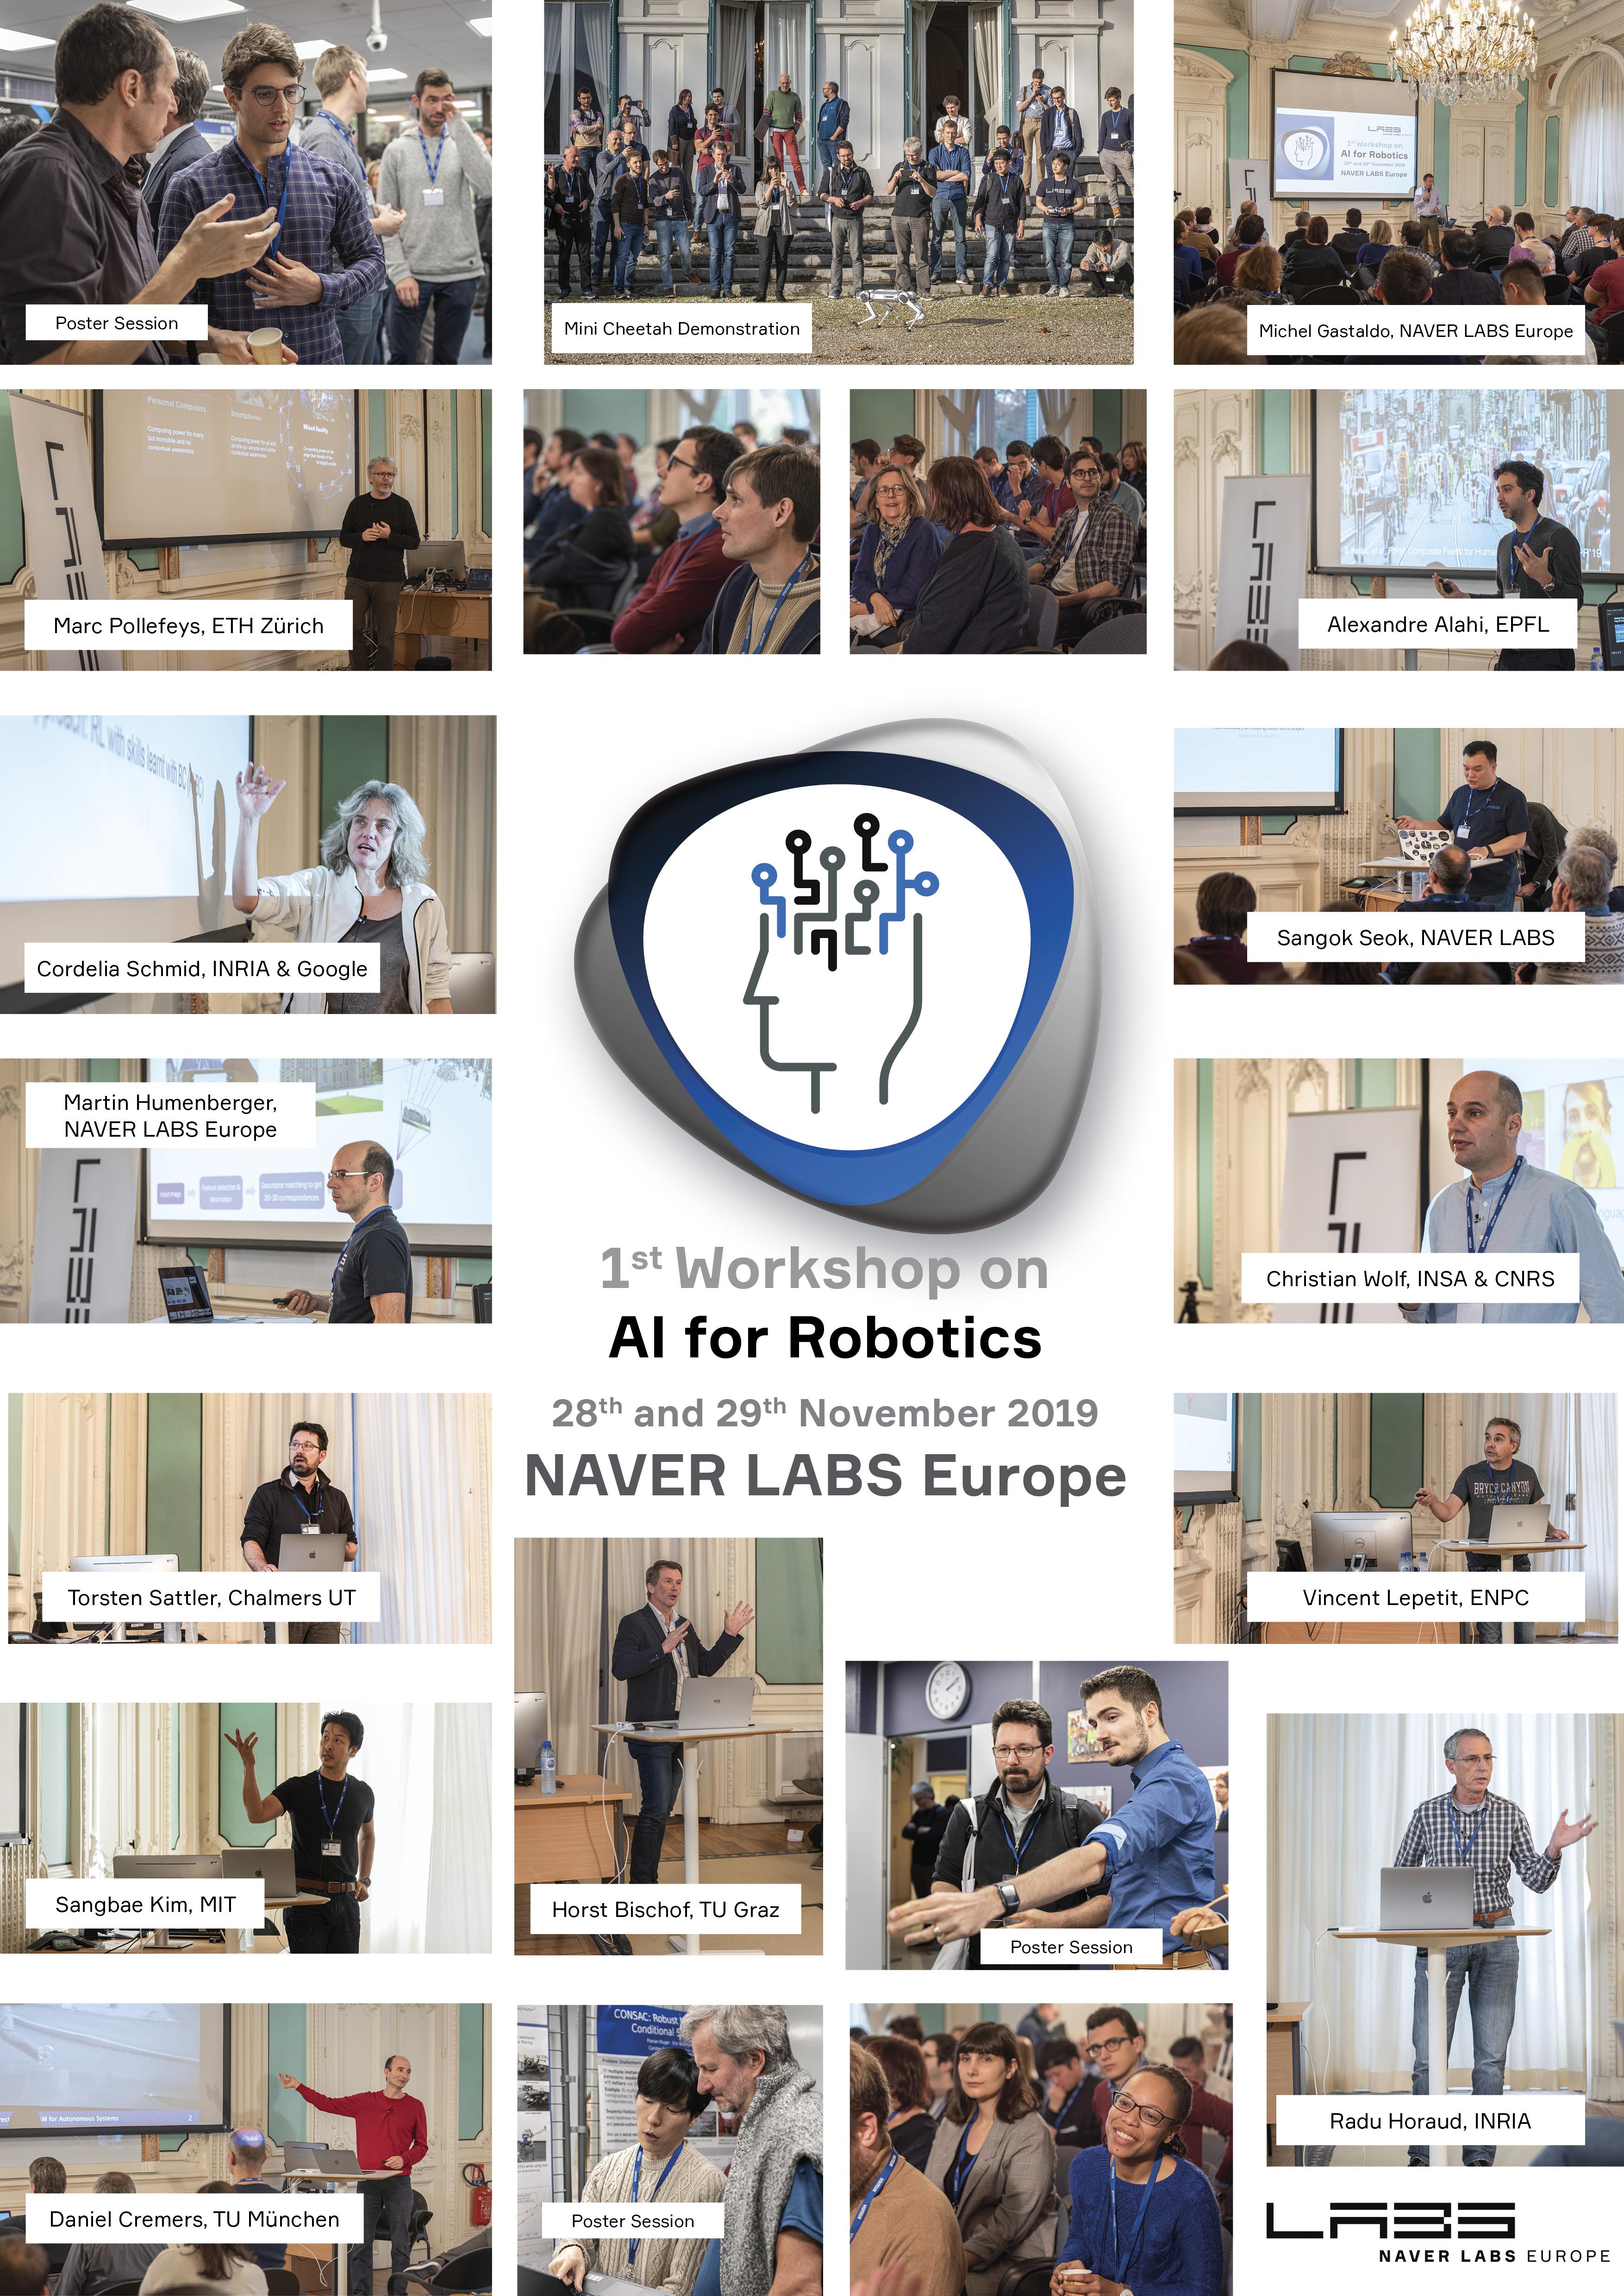 AI for robotics workshop photos